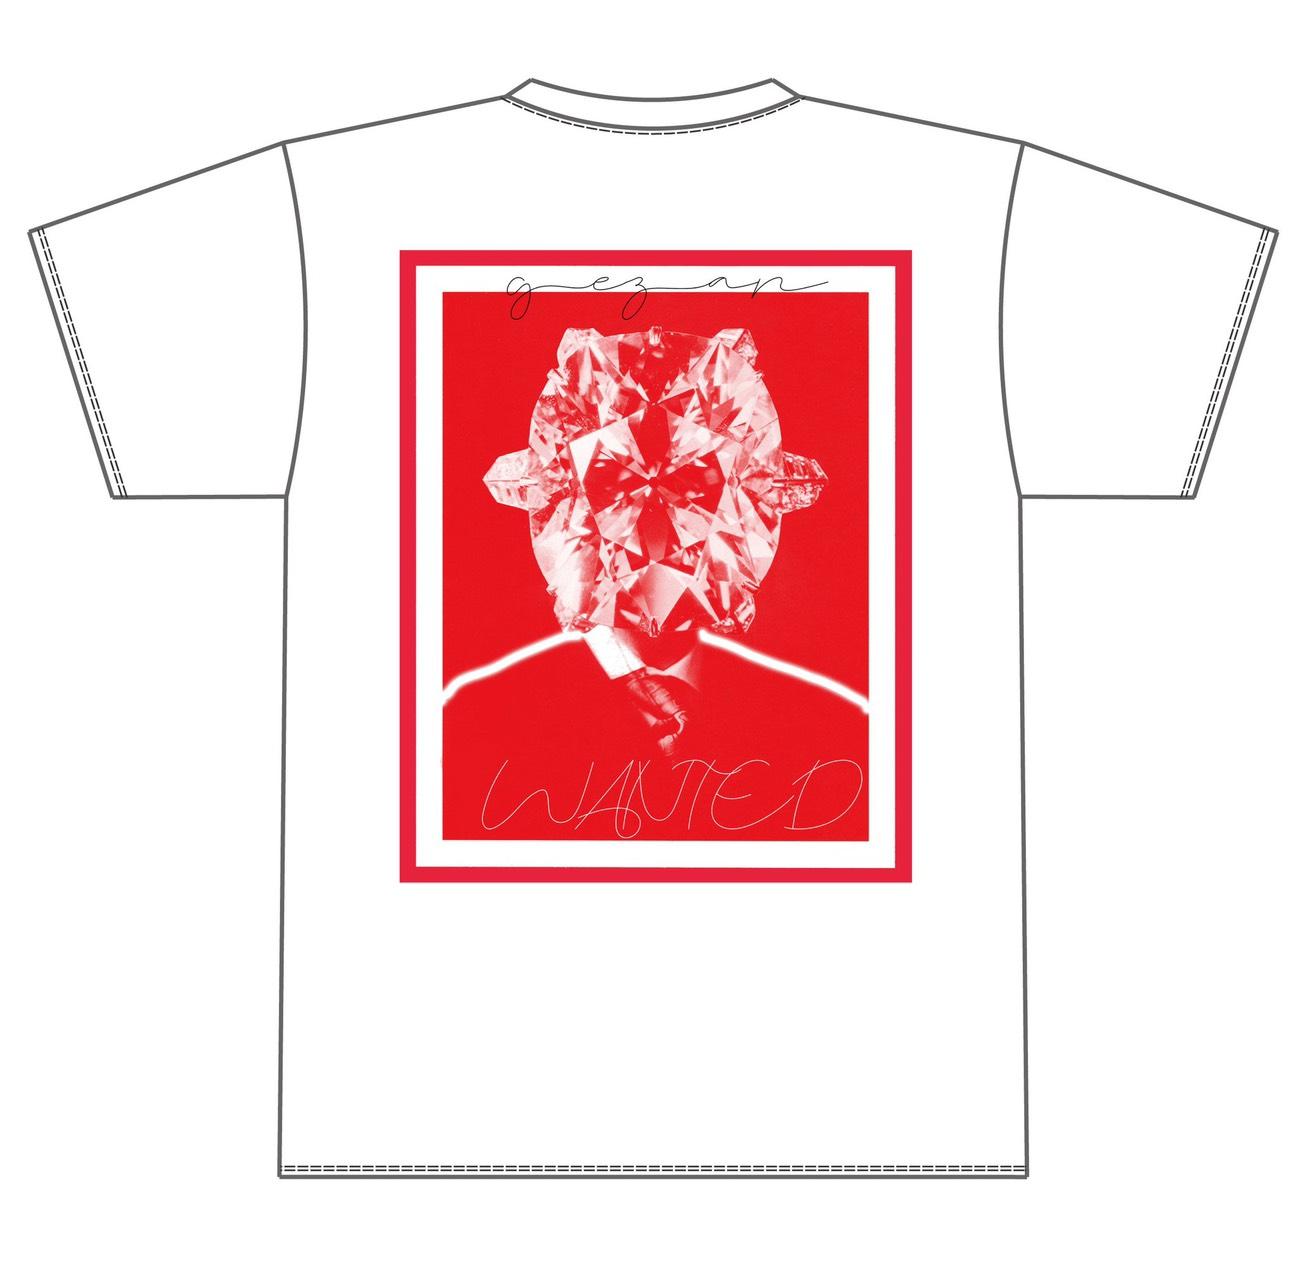 「made in 新代田」よりGEZAN//NEW DIAMOND T-Shirtsが発売されました。